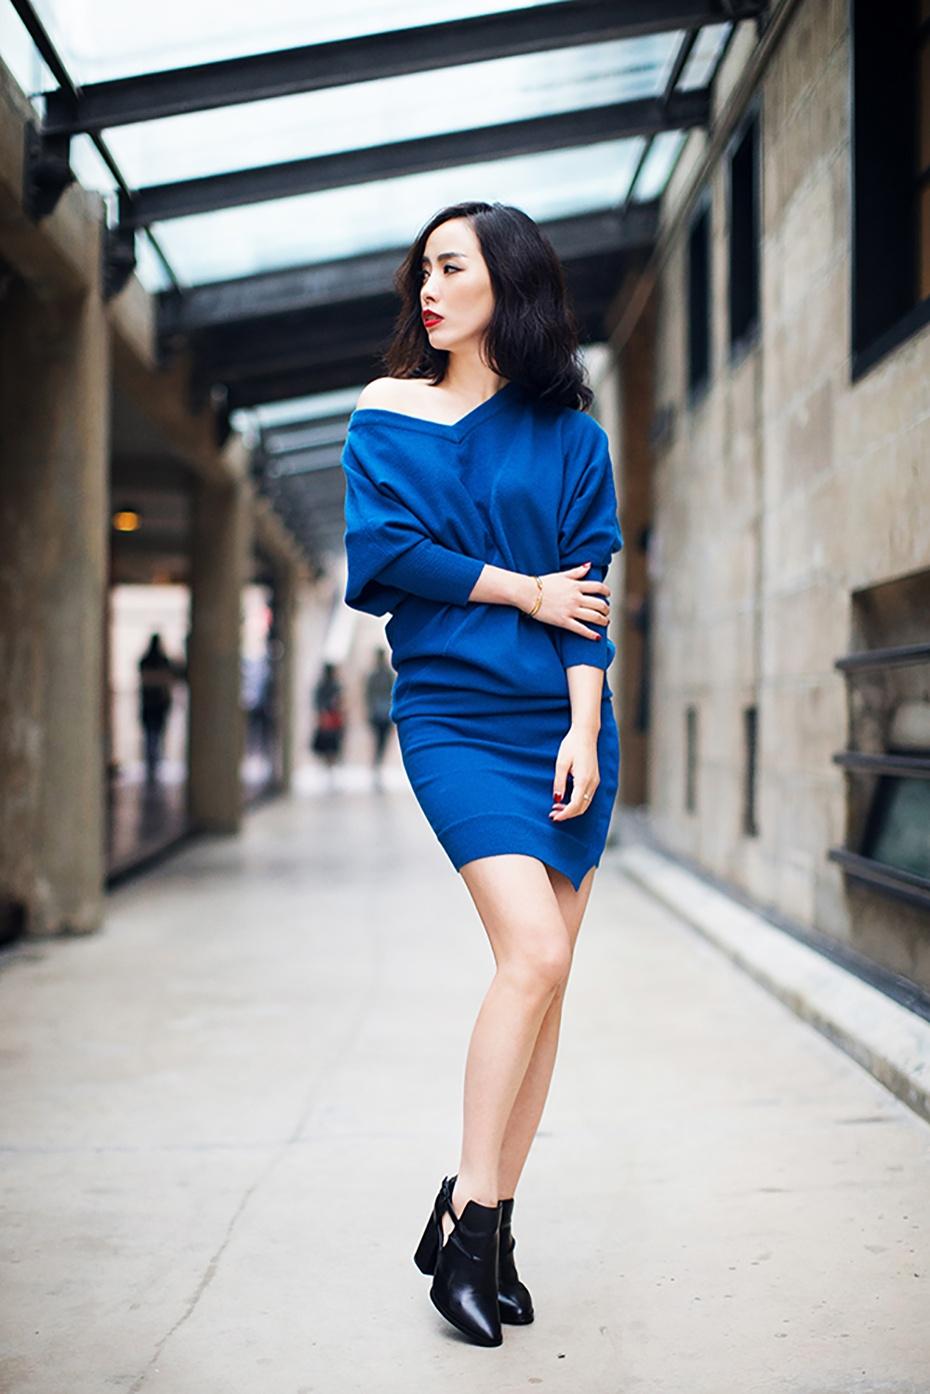 【妮儿の私服日记】冬日里属于我的力量 - Nikki妮儿 - Nikkis Fashion Blog